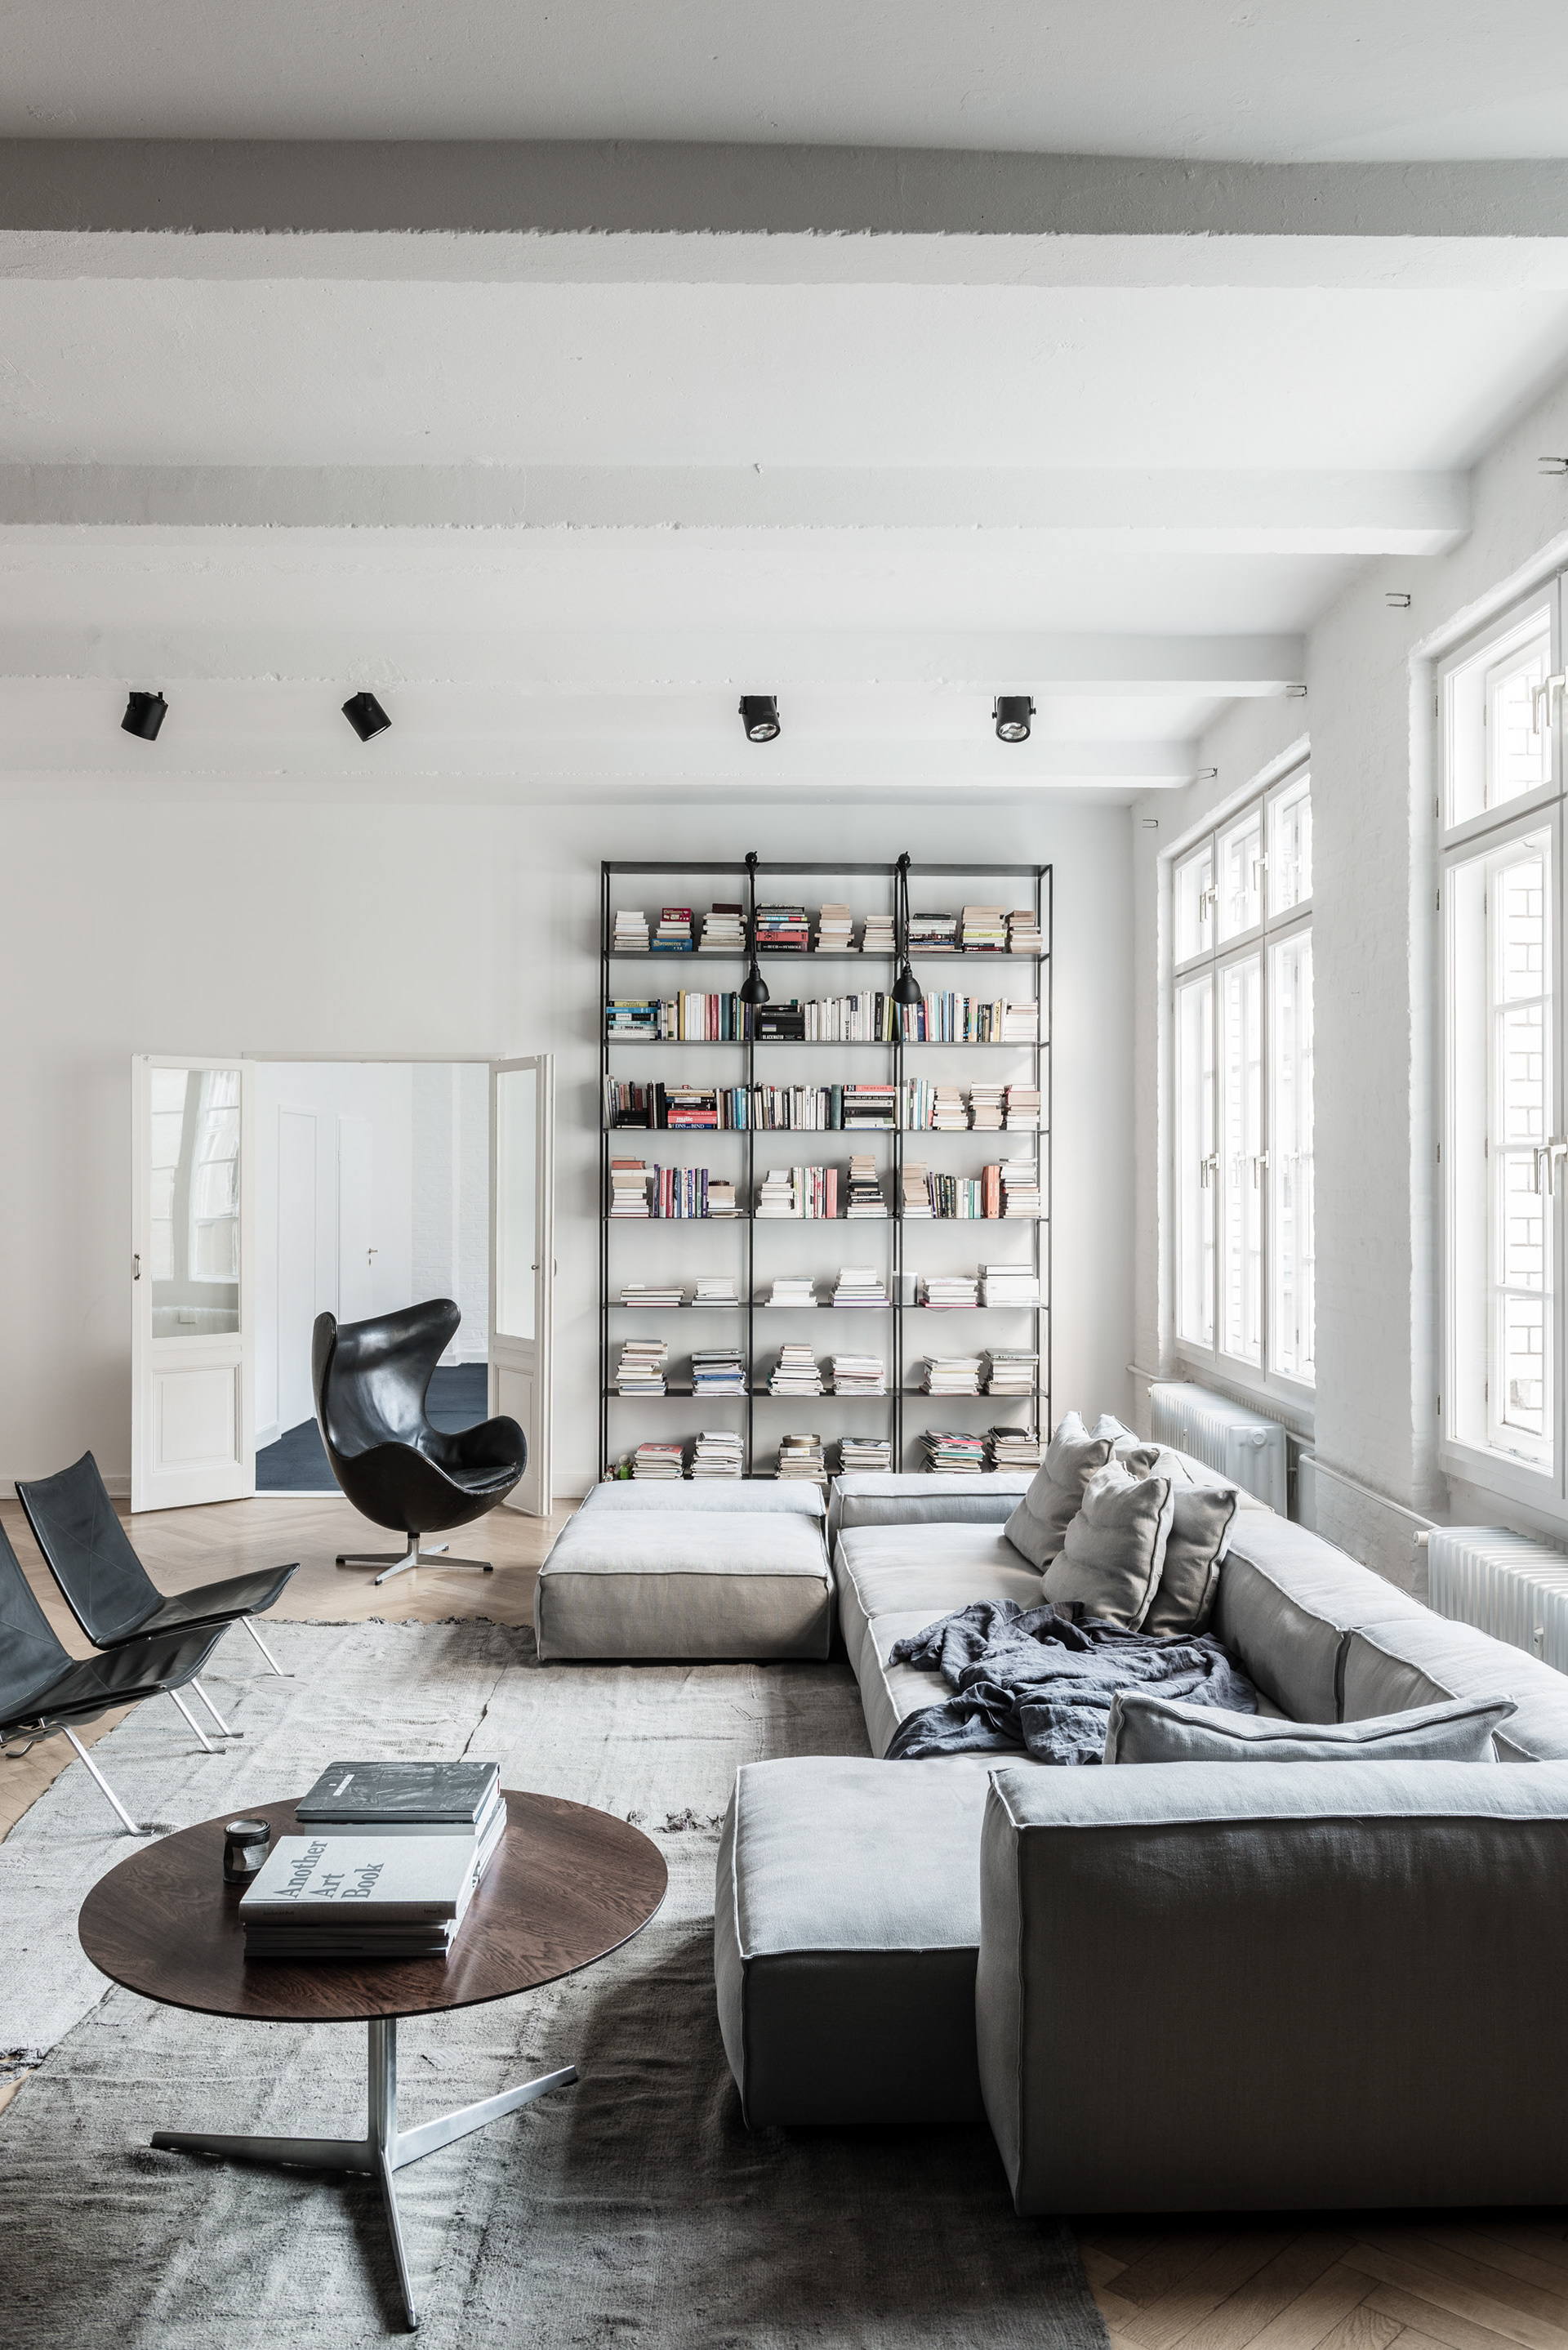 Annabell Kutucu Loft Apartment Studio Berlin - Apartments-interior-design